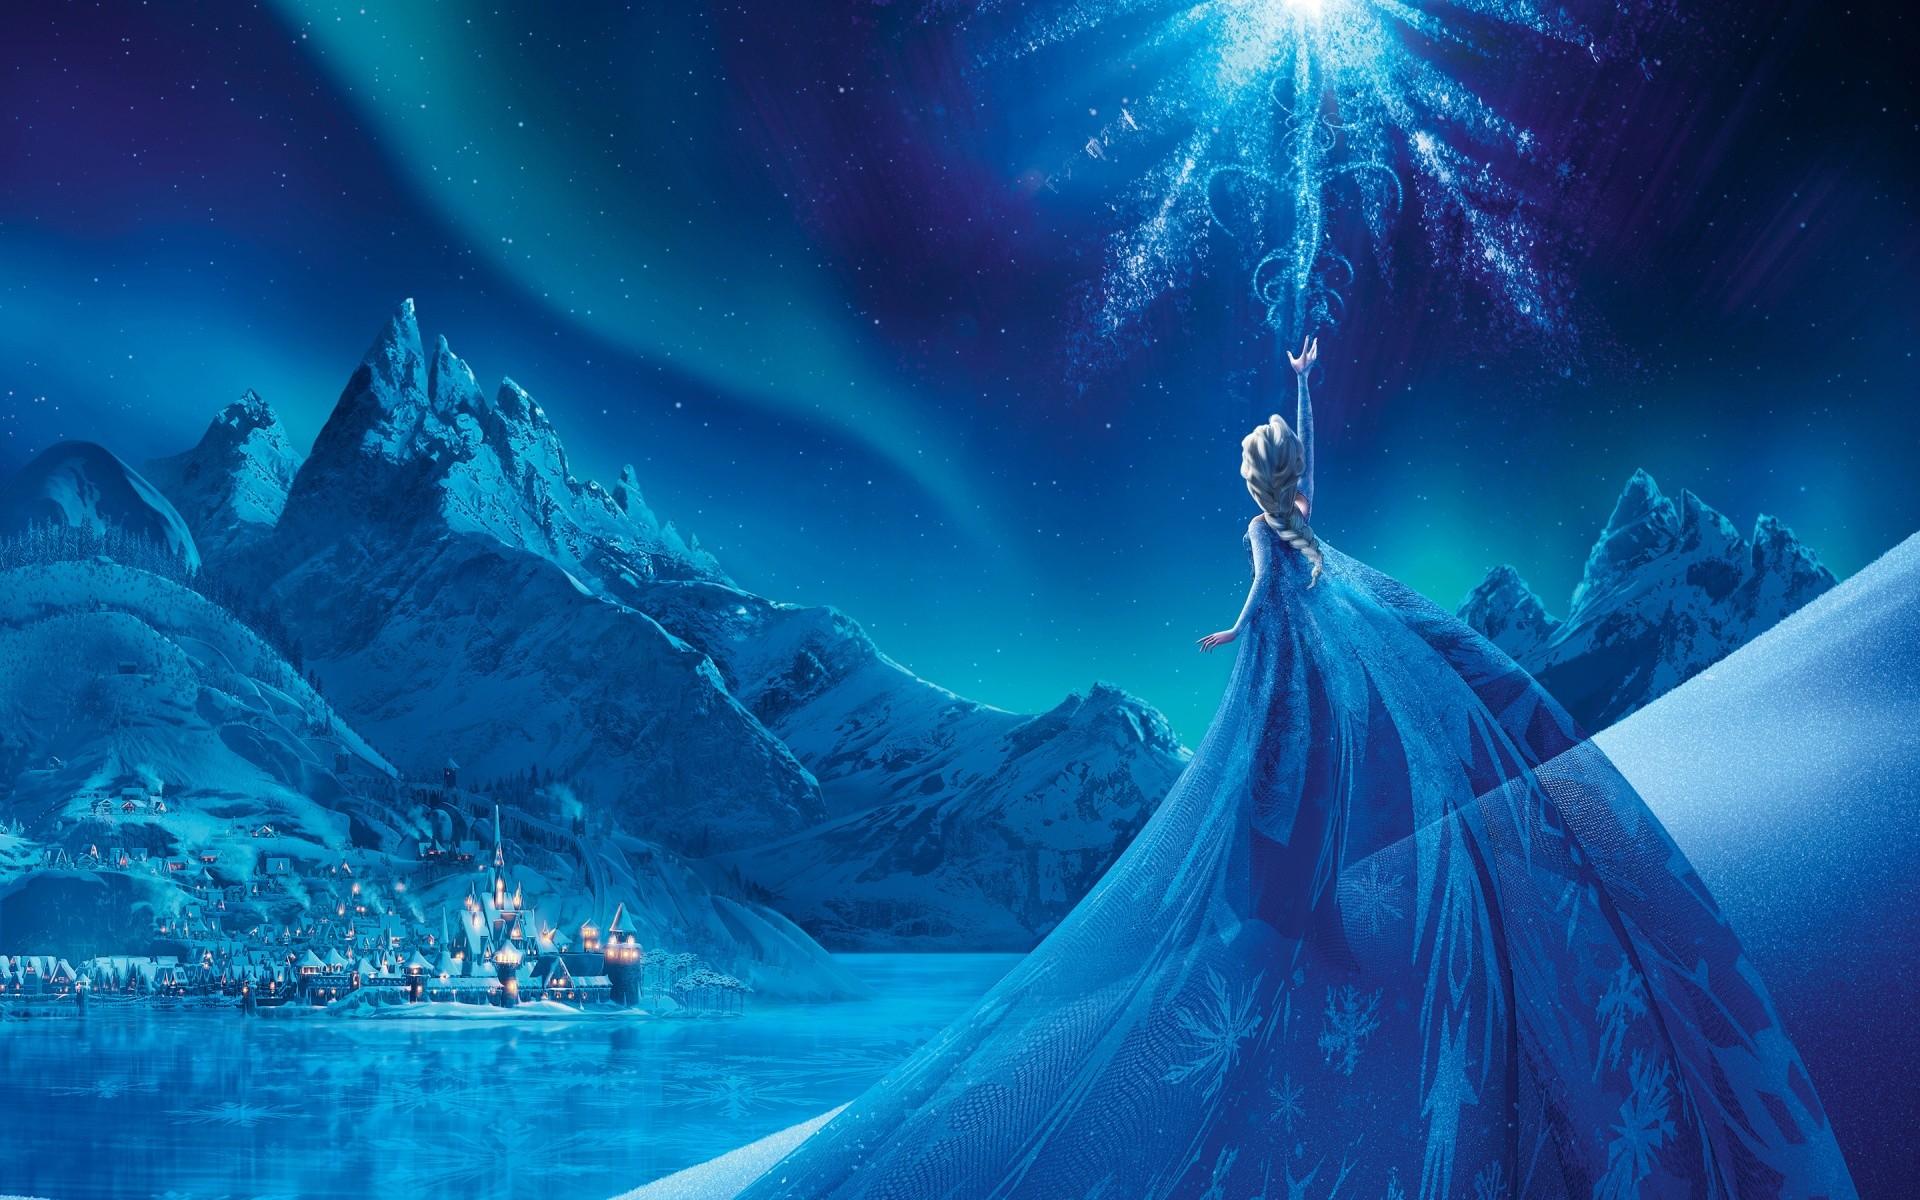 Frozen Elsa Wallpapers – Free download latest Frozen Elsa Wallpapers for  Computer, Mobile, iPhone